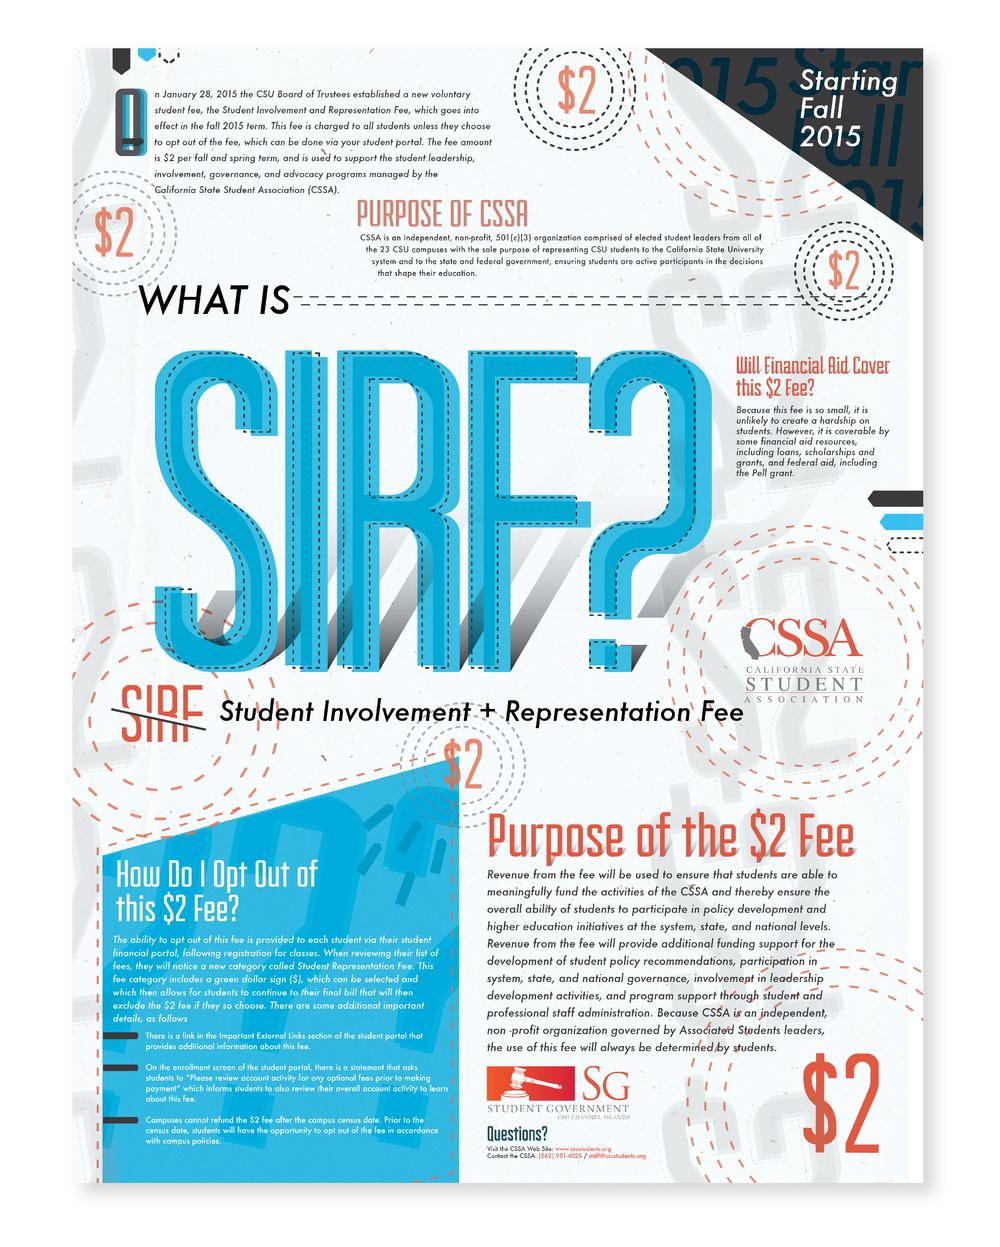 Ben Blanchard / Sirf2